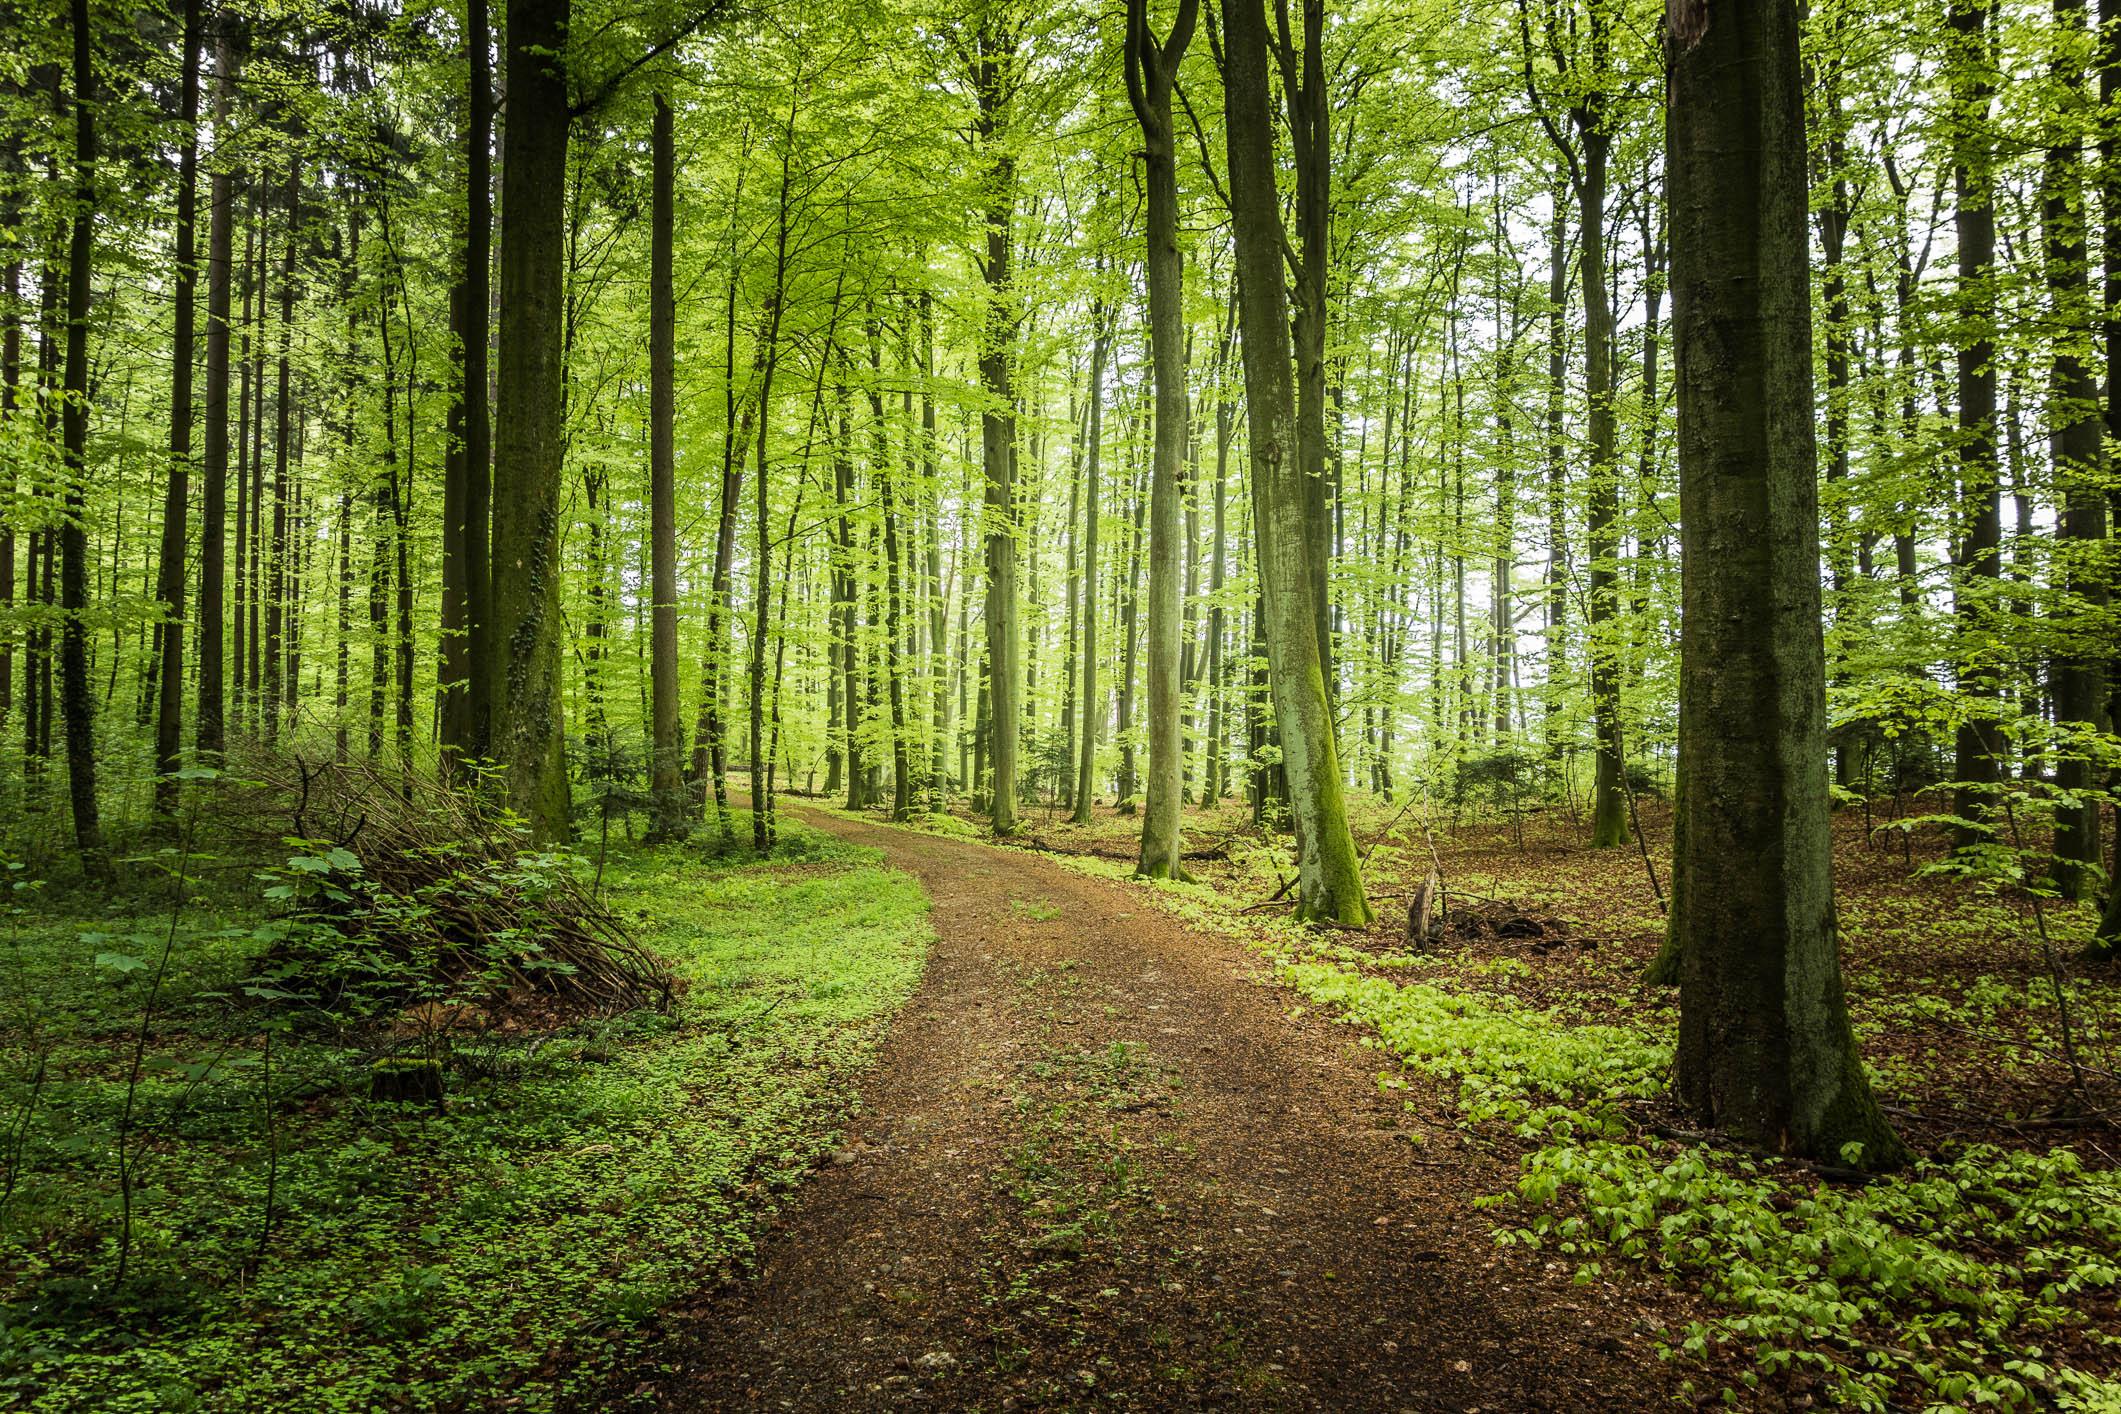 299175339_road_forest_trees_landscape_f_wallpaper_1_122_159lo.jpg